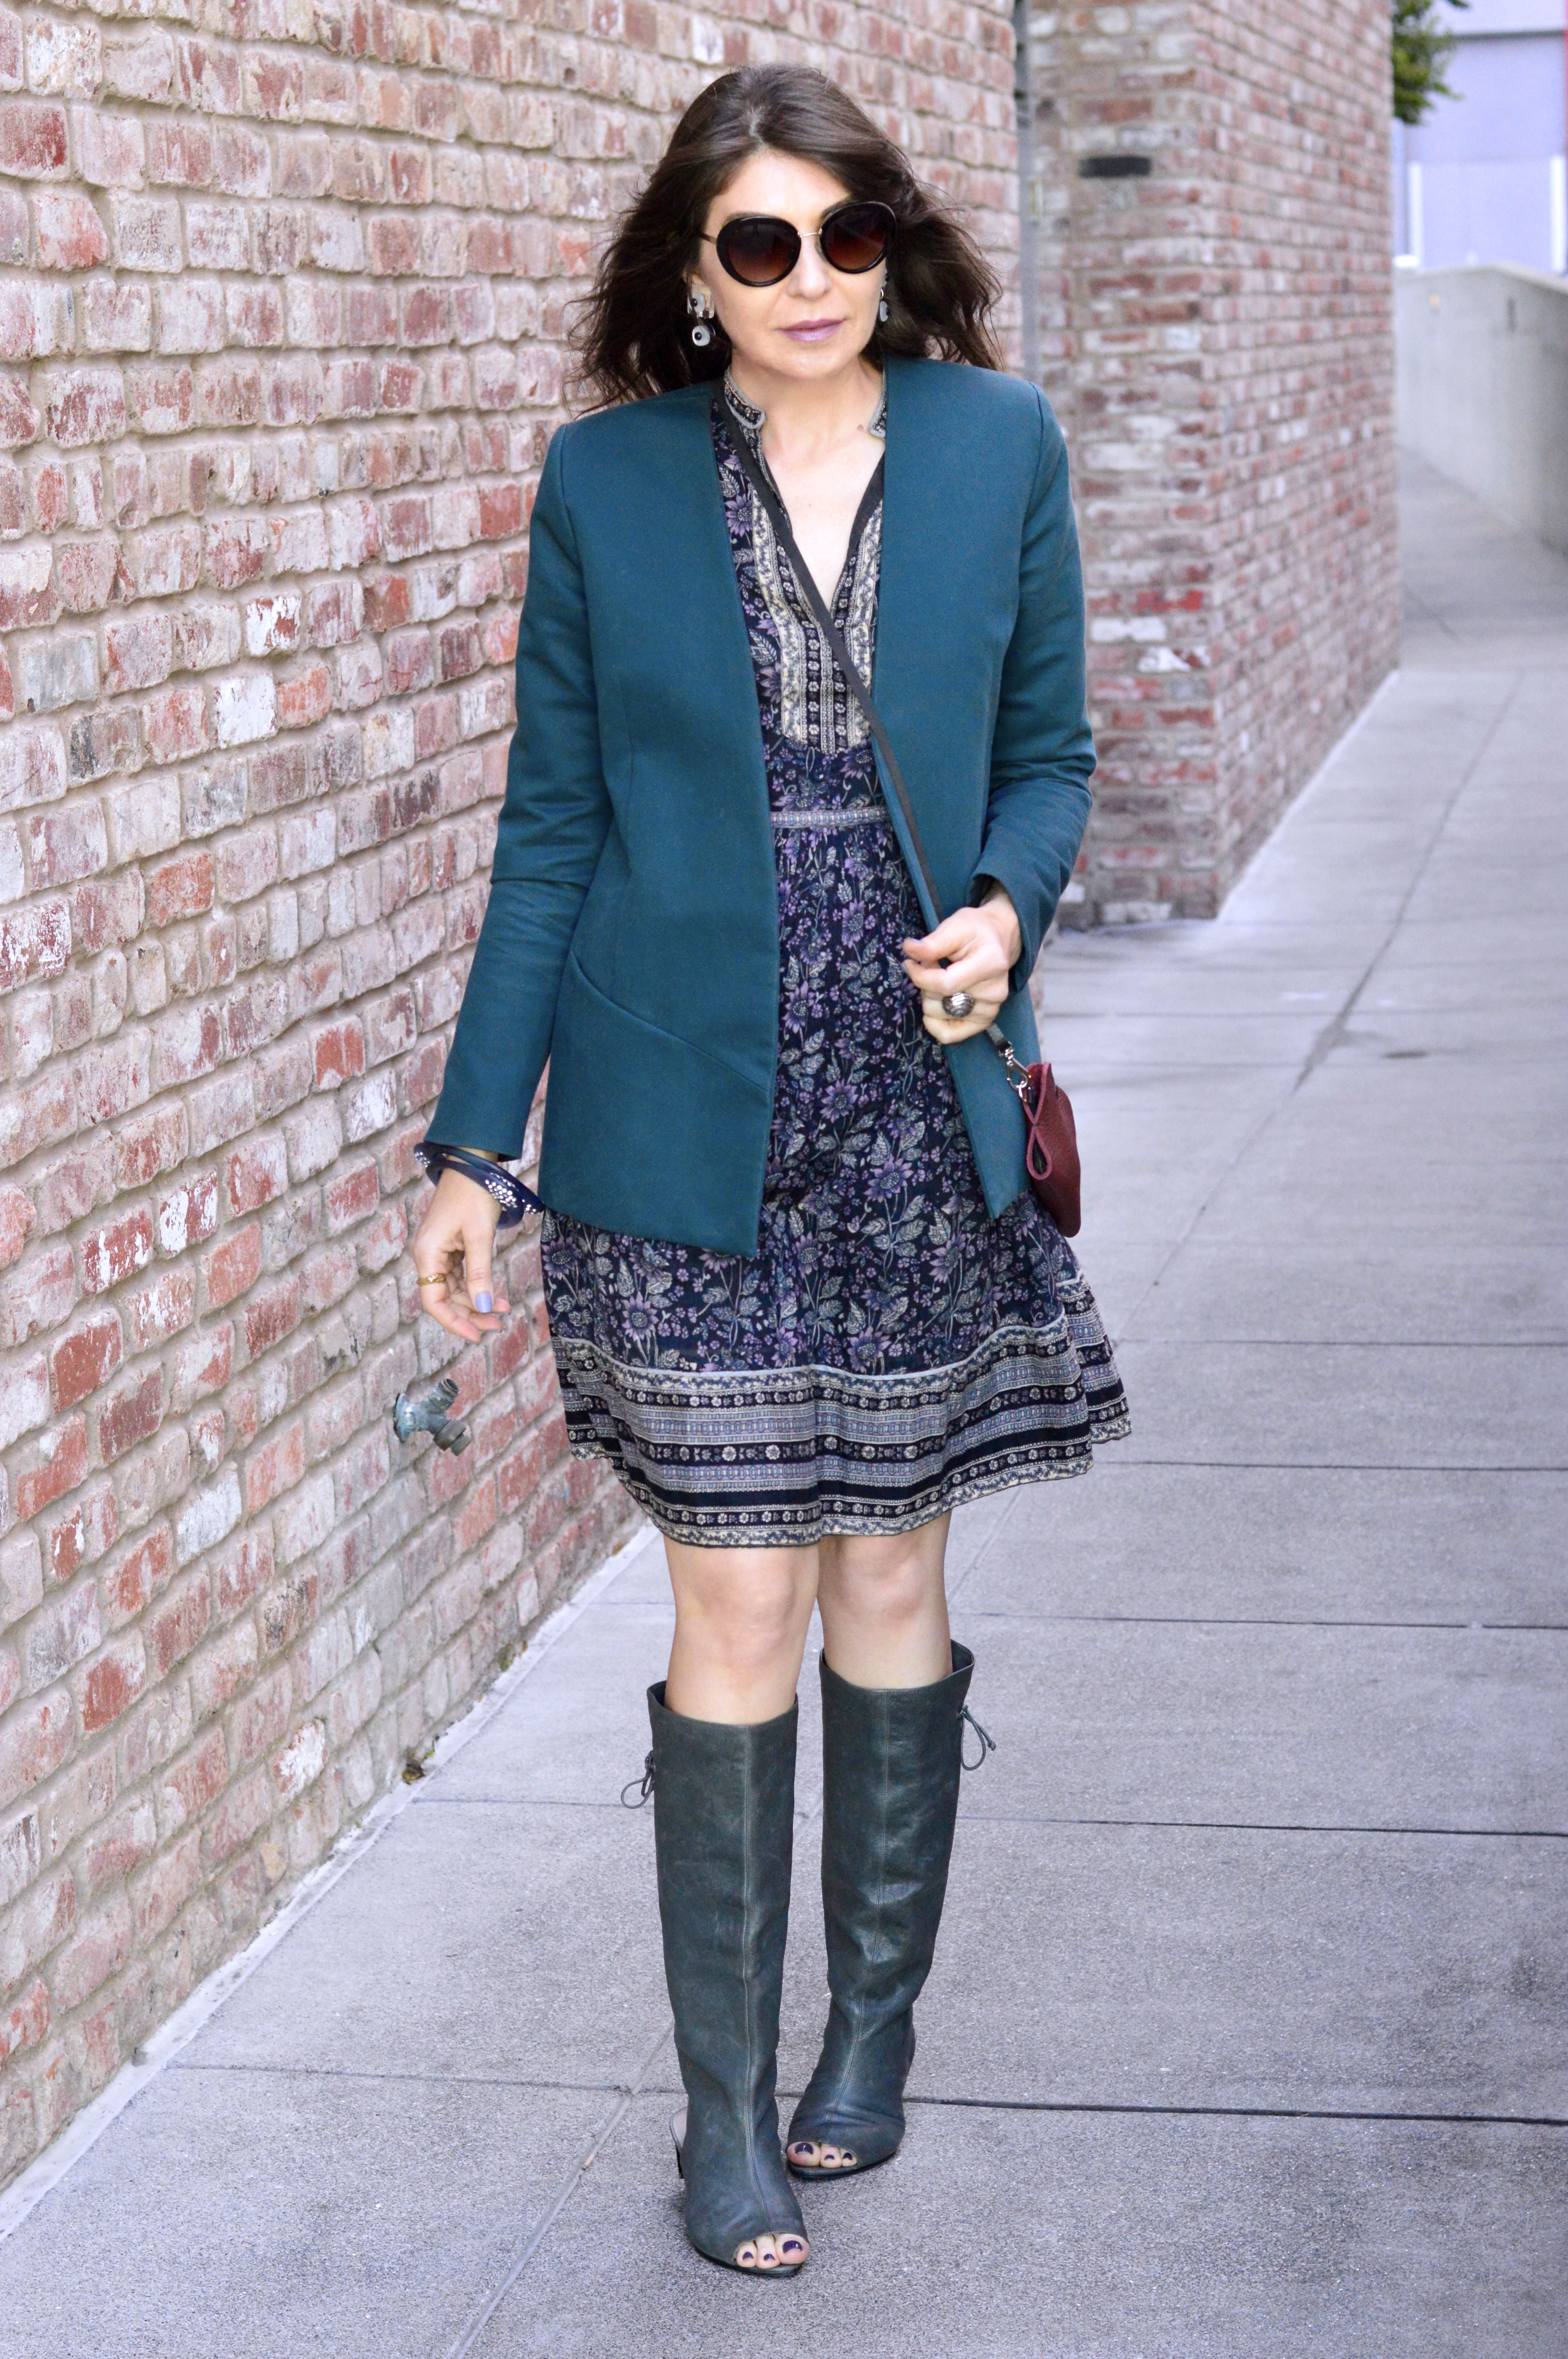 Vintage boho dress and peep-toe boots.